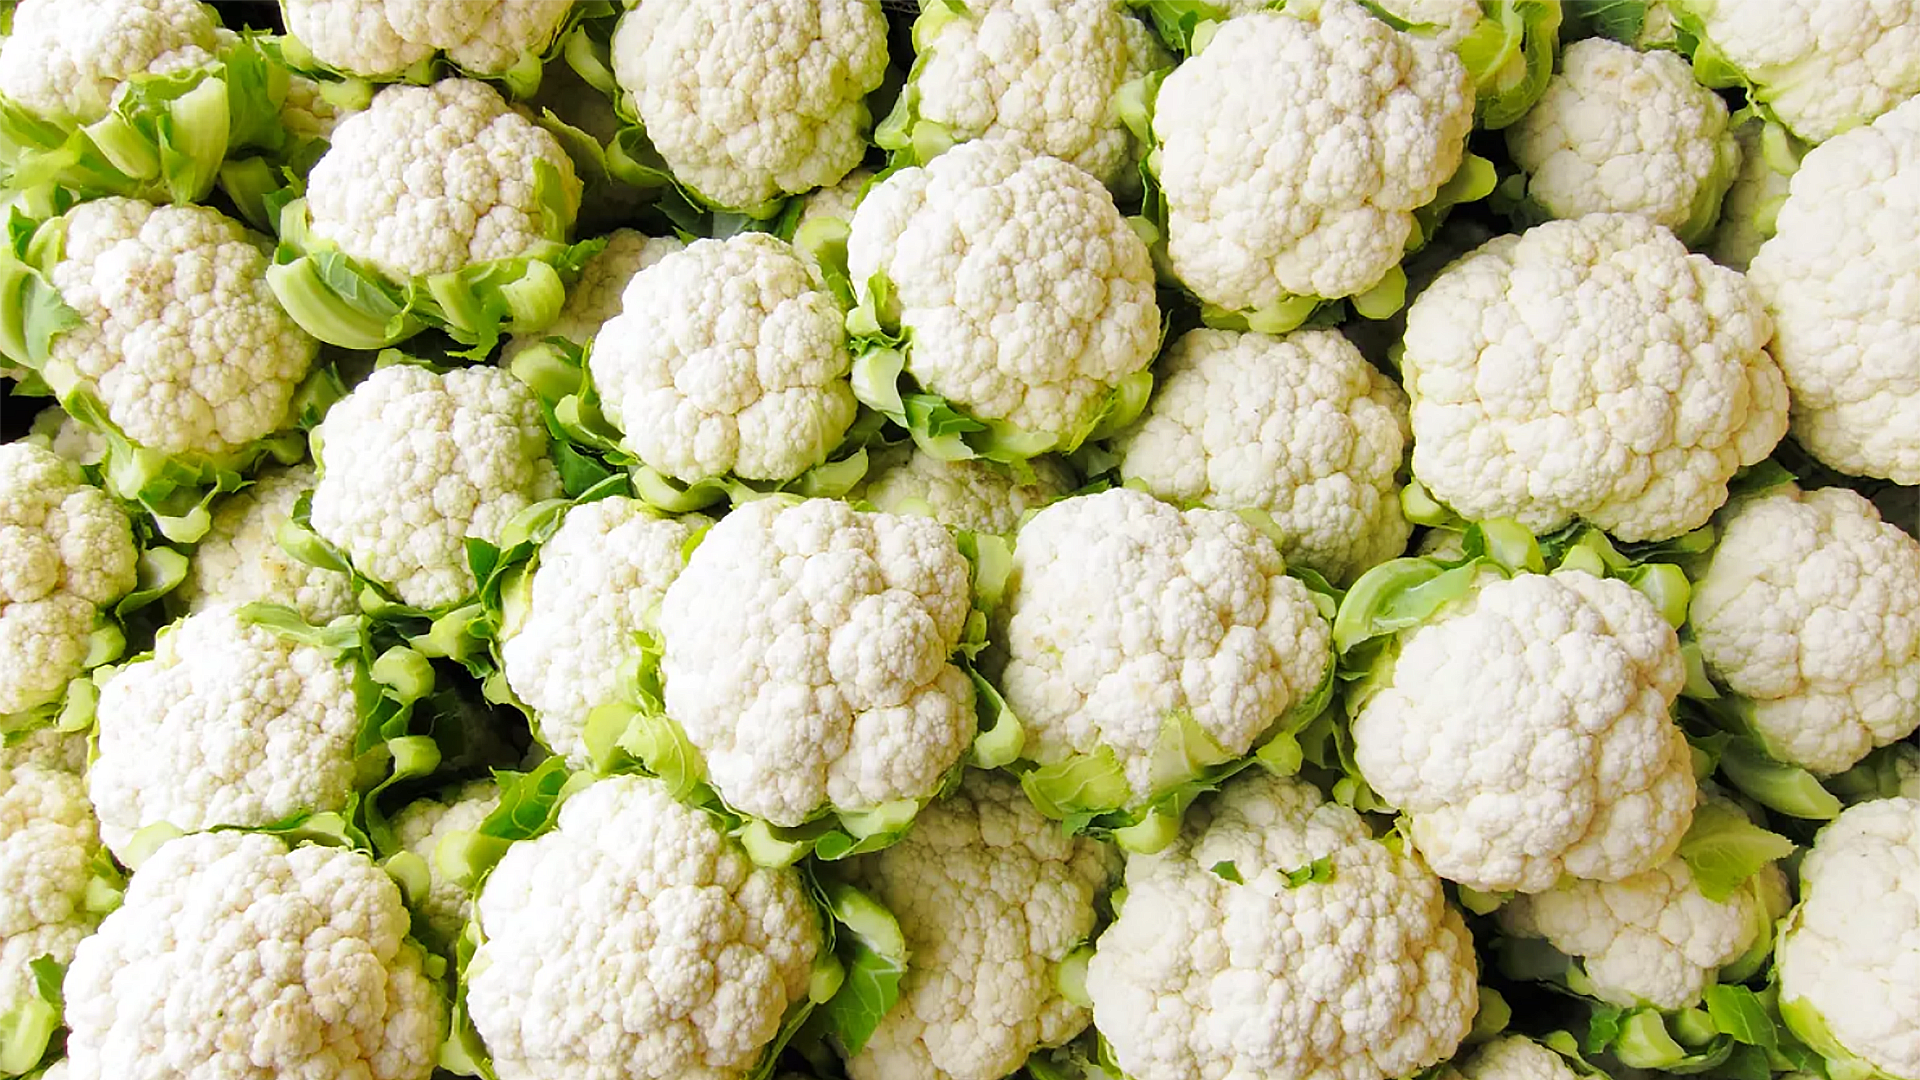 Fresh Cauliflower Bunches